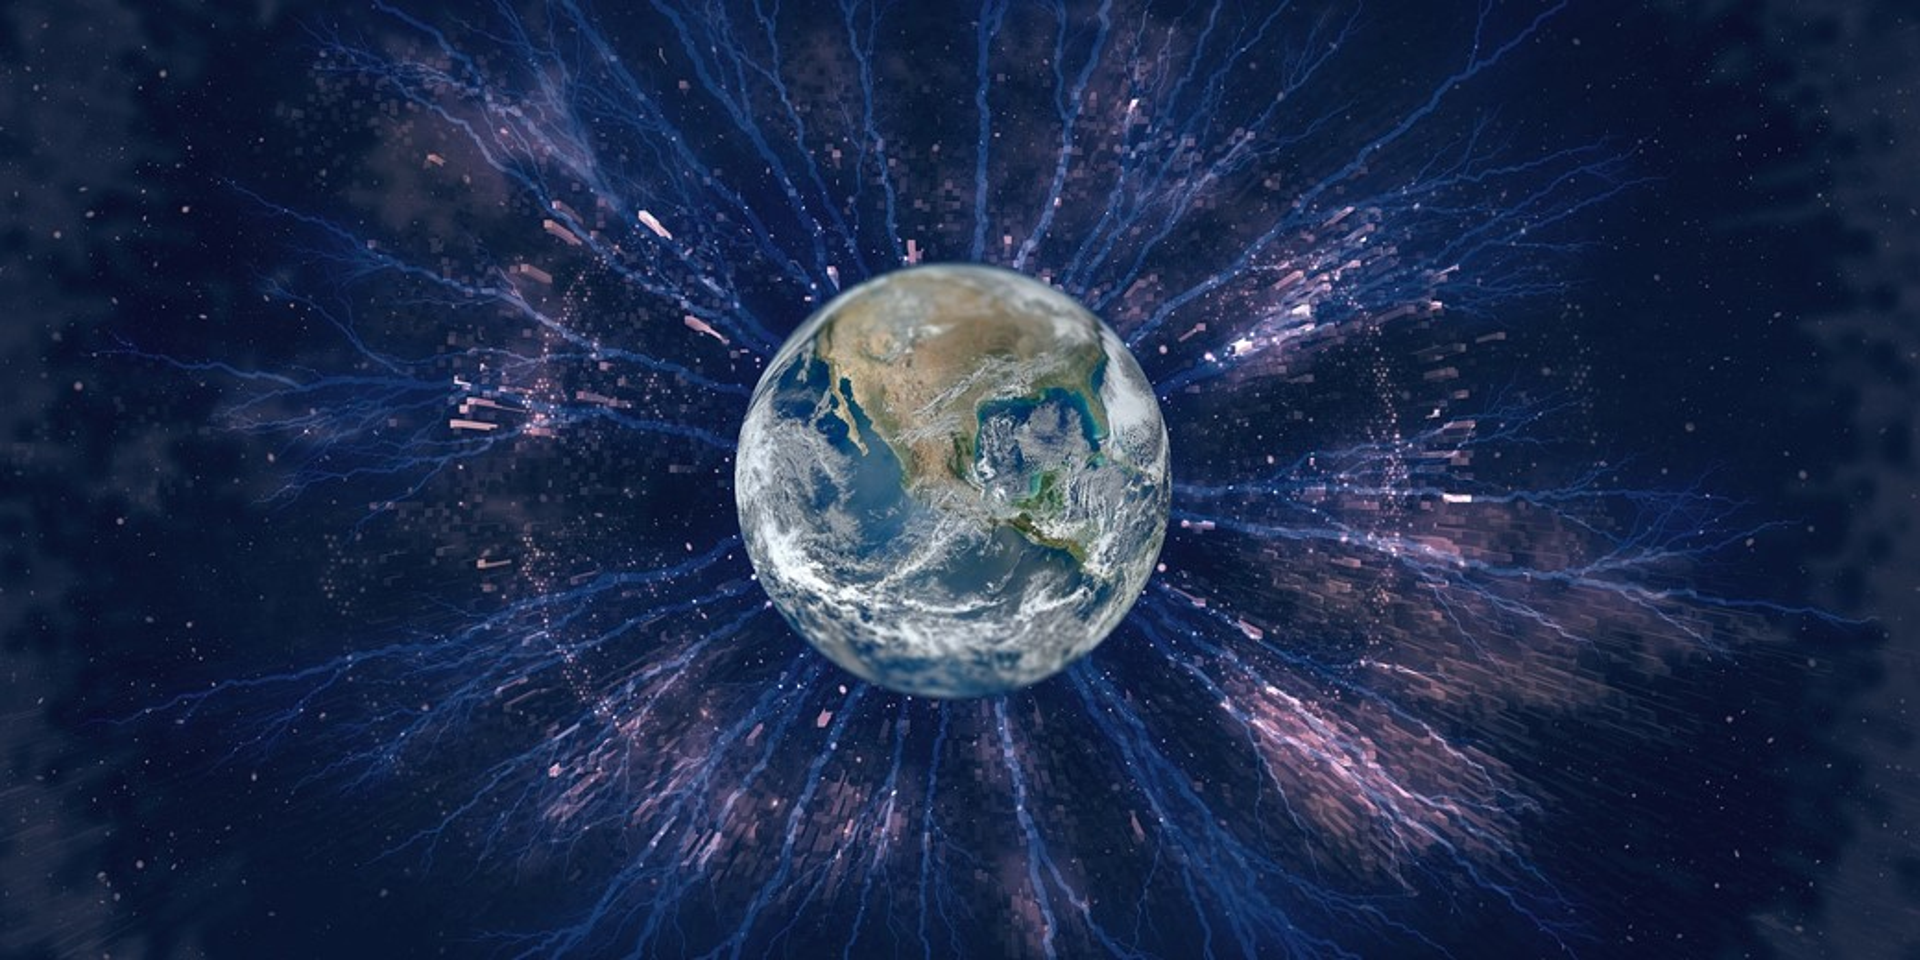 Terra possui sinfonia atmosférica única.